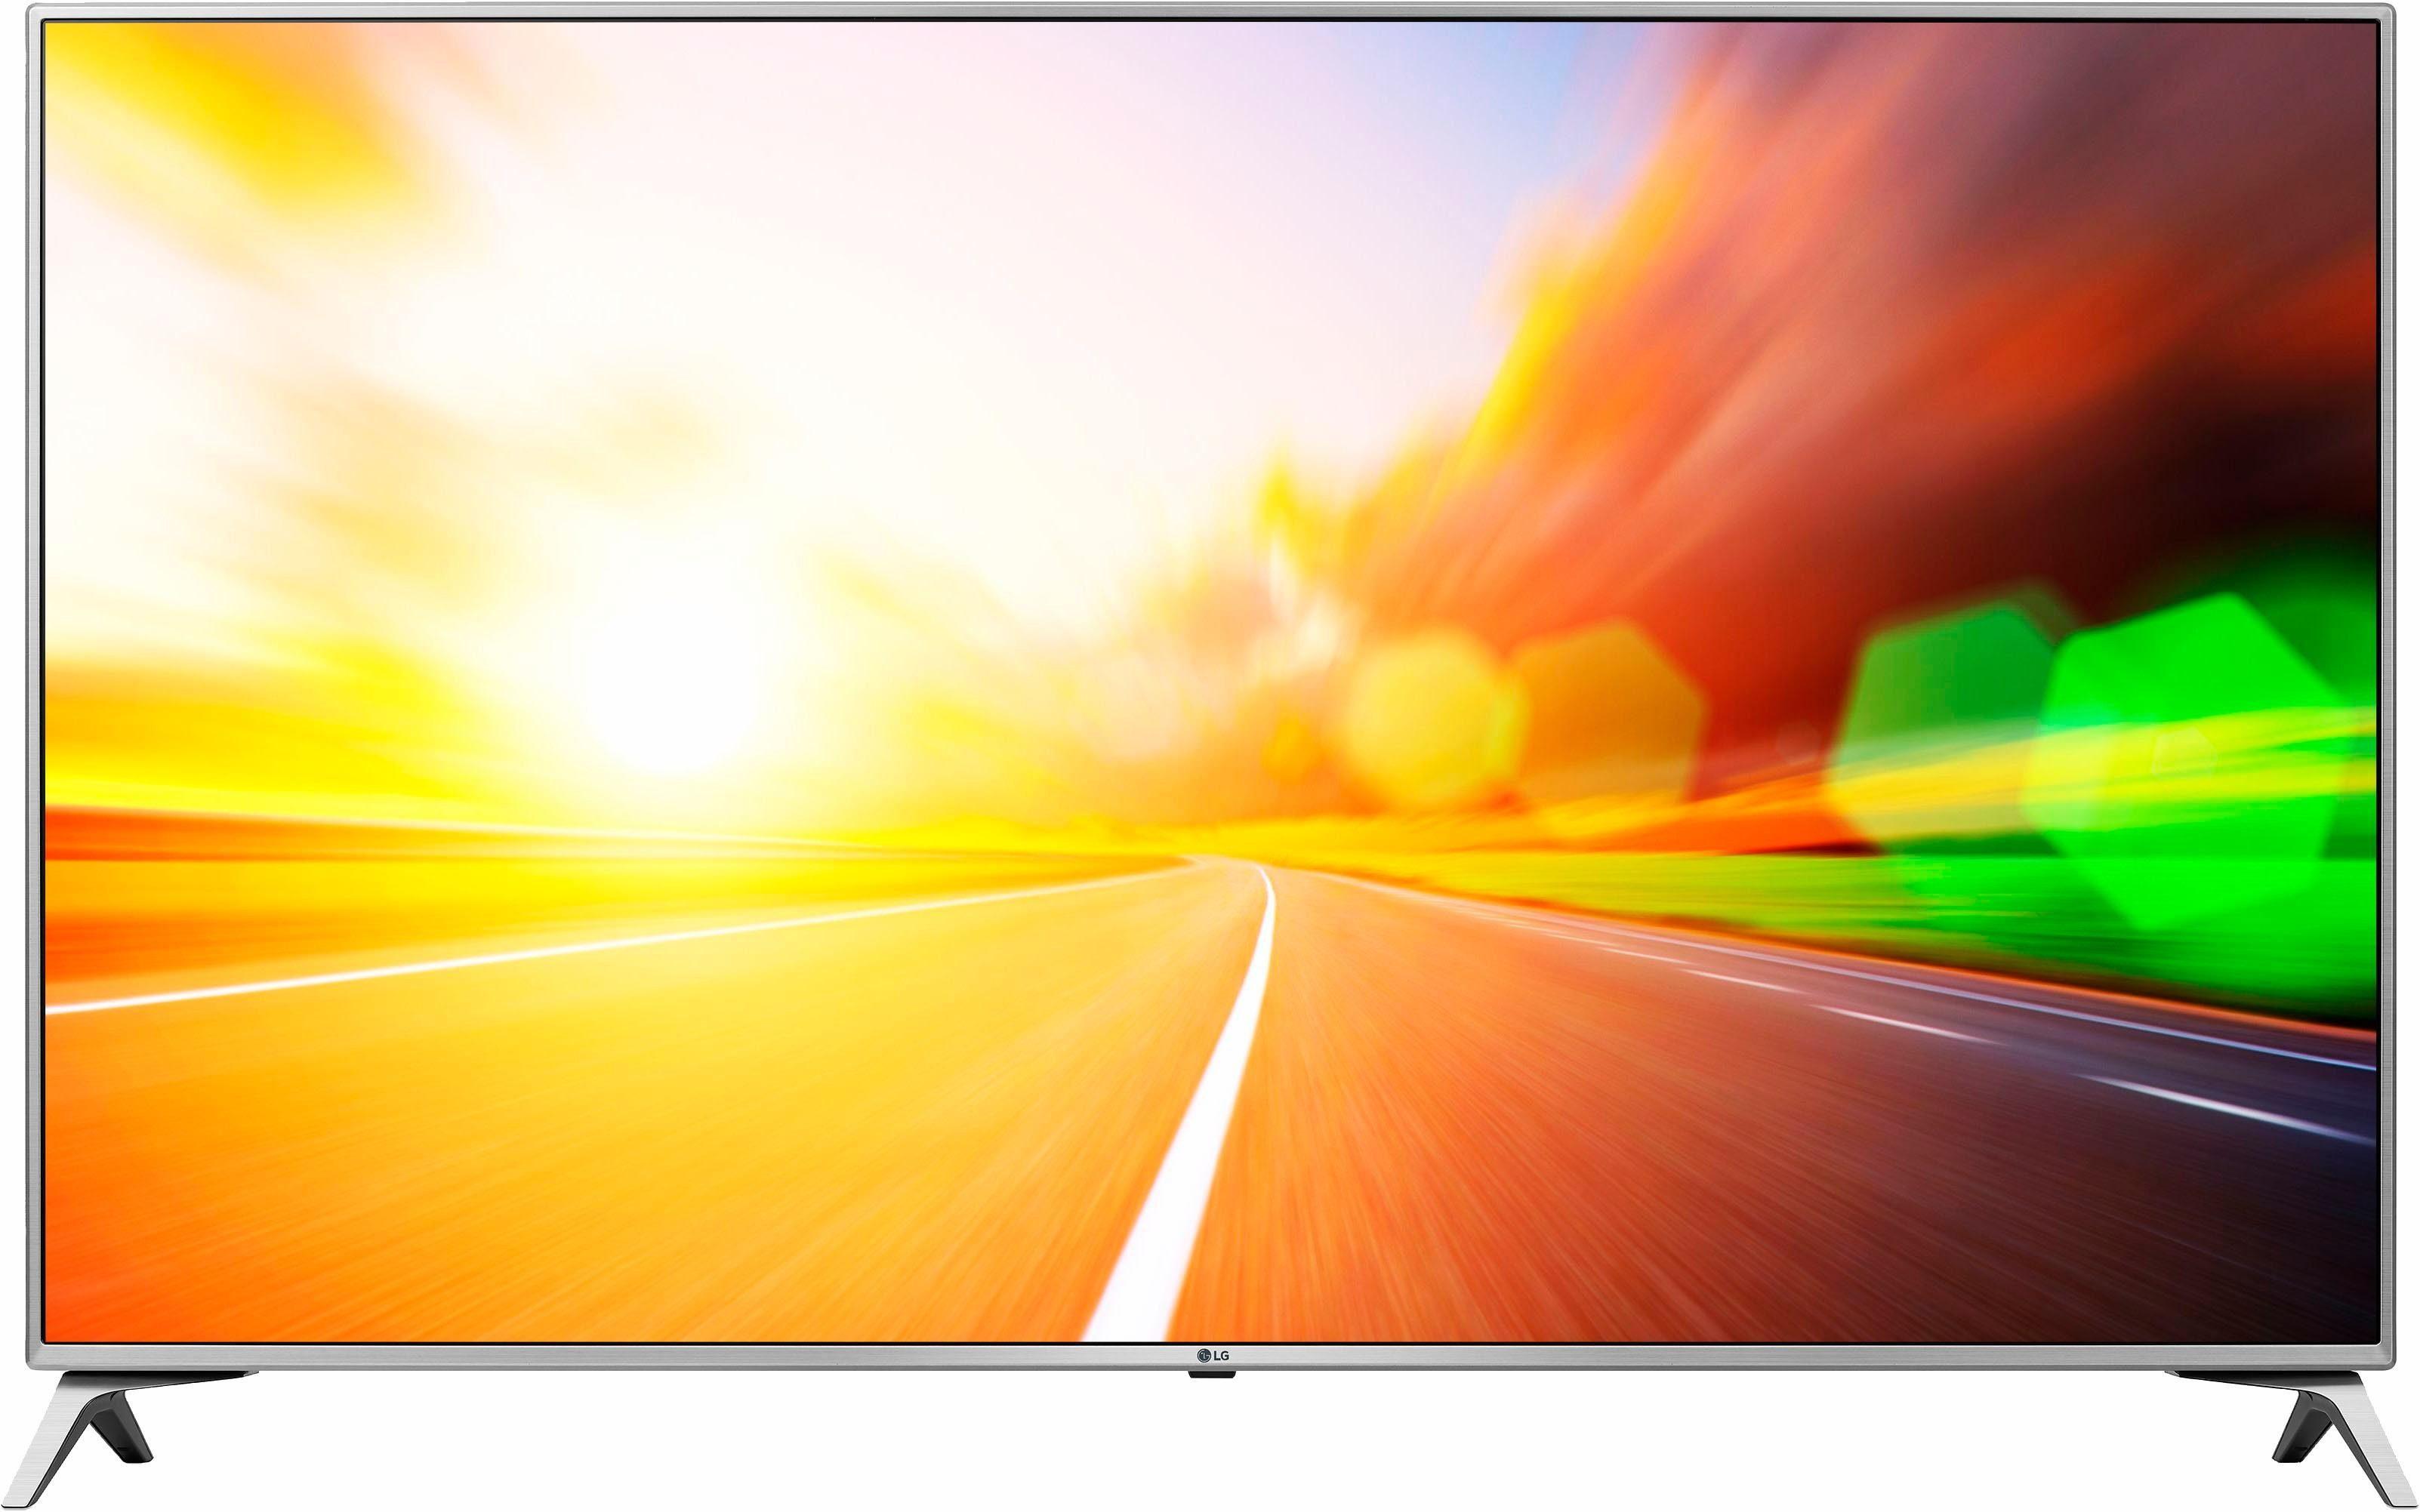 LG 60UJ6519 LED Fernseher (151 cm / 60 Zoll, UHD/4K, Smart-TV)